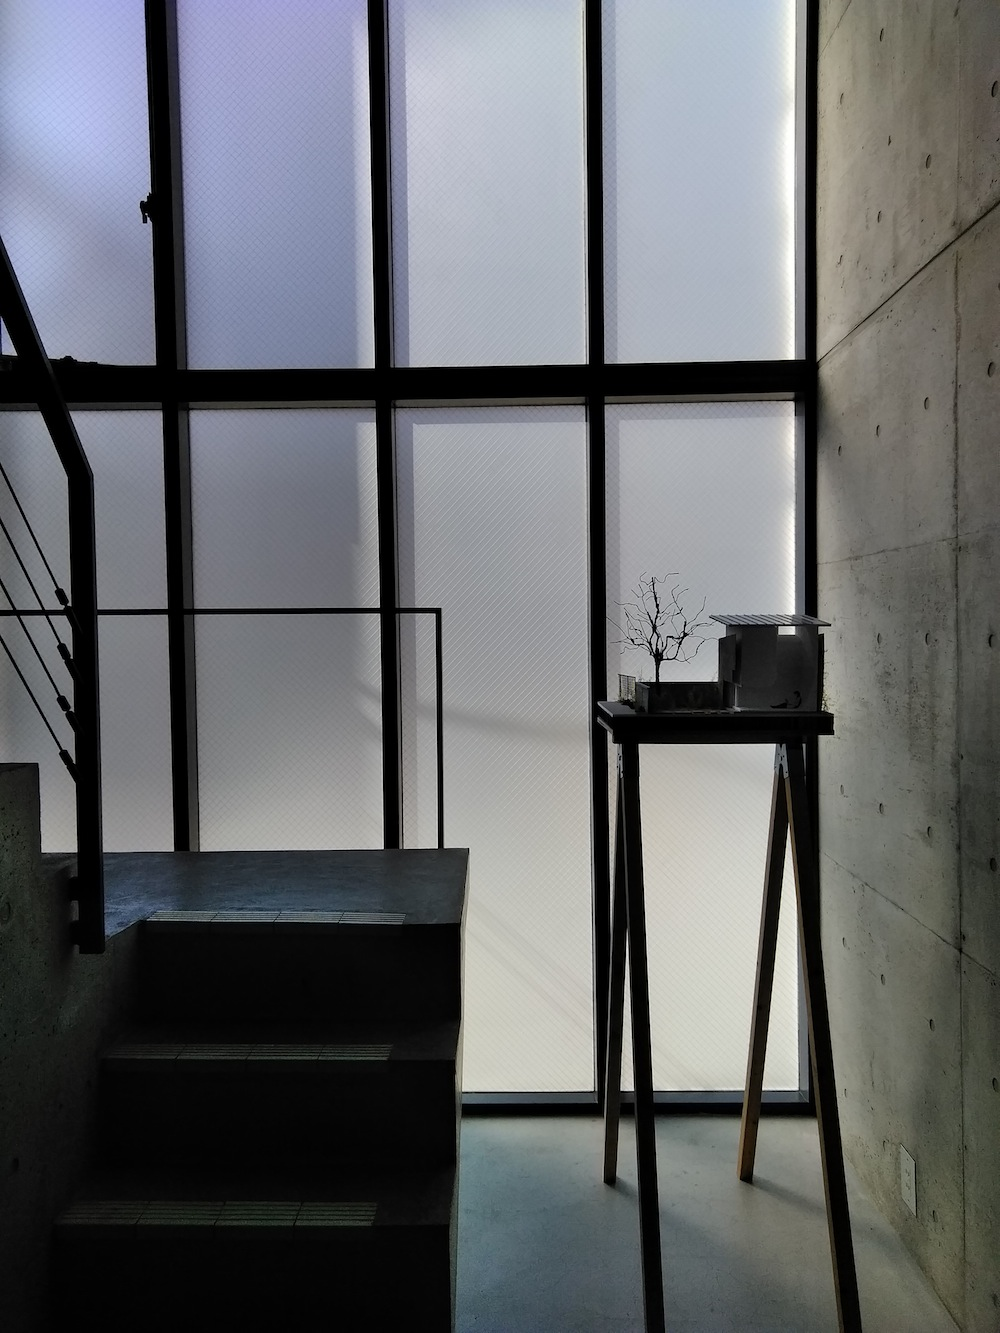 日本橋の家,安藤忠雄,生きた建築ミュージアム,大阪,建築家,神戸,京都,関西,住宅設計事務所